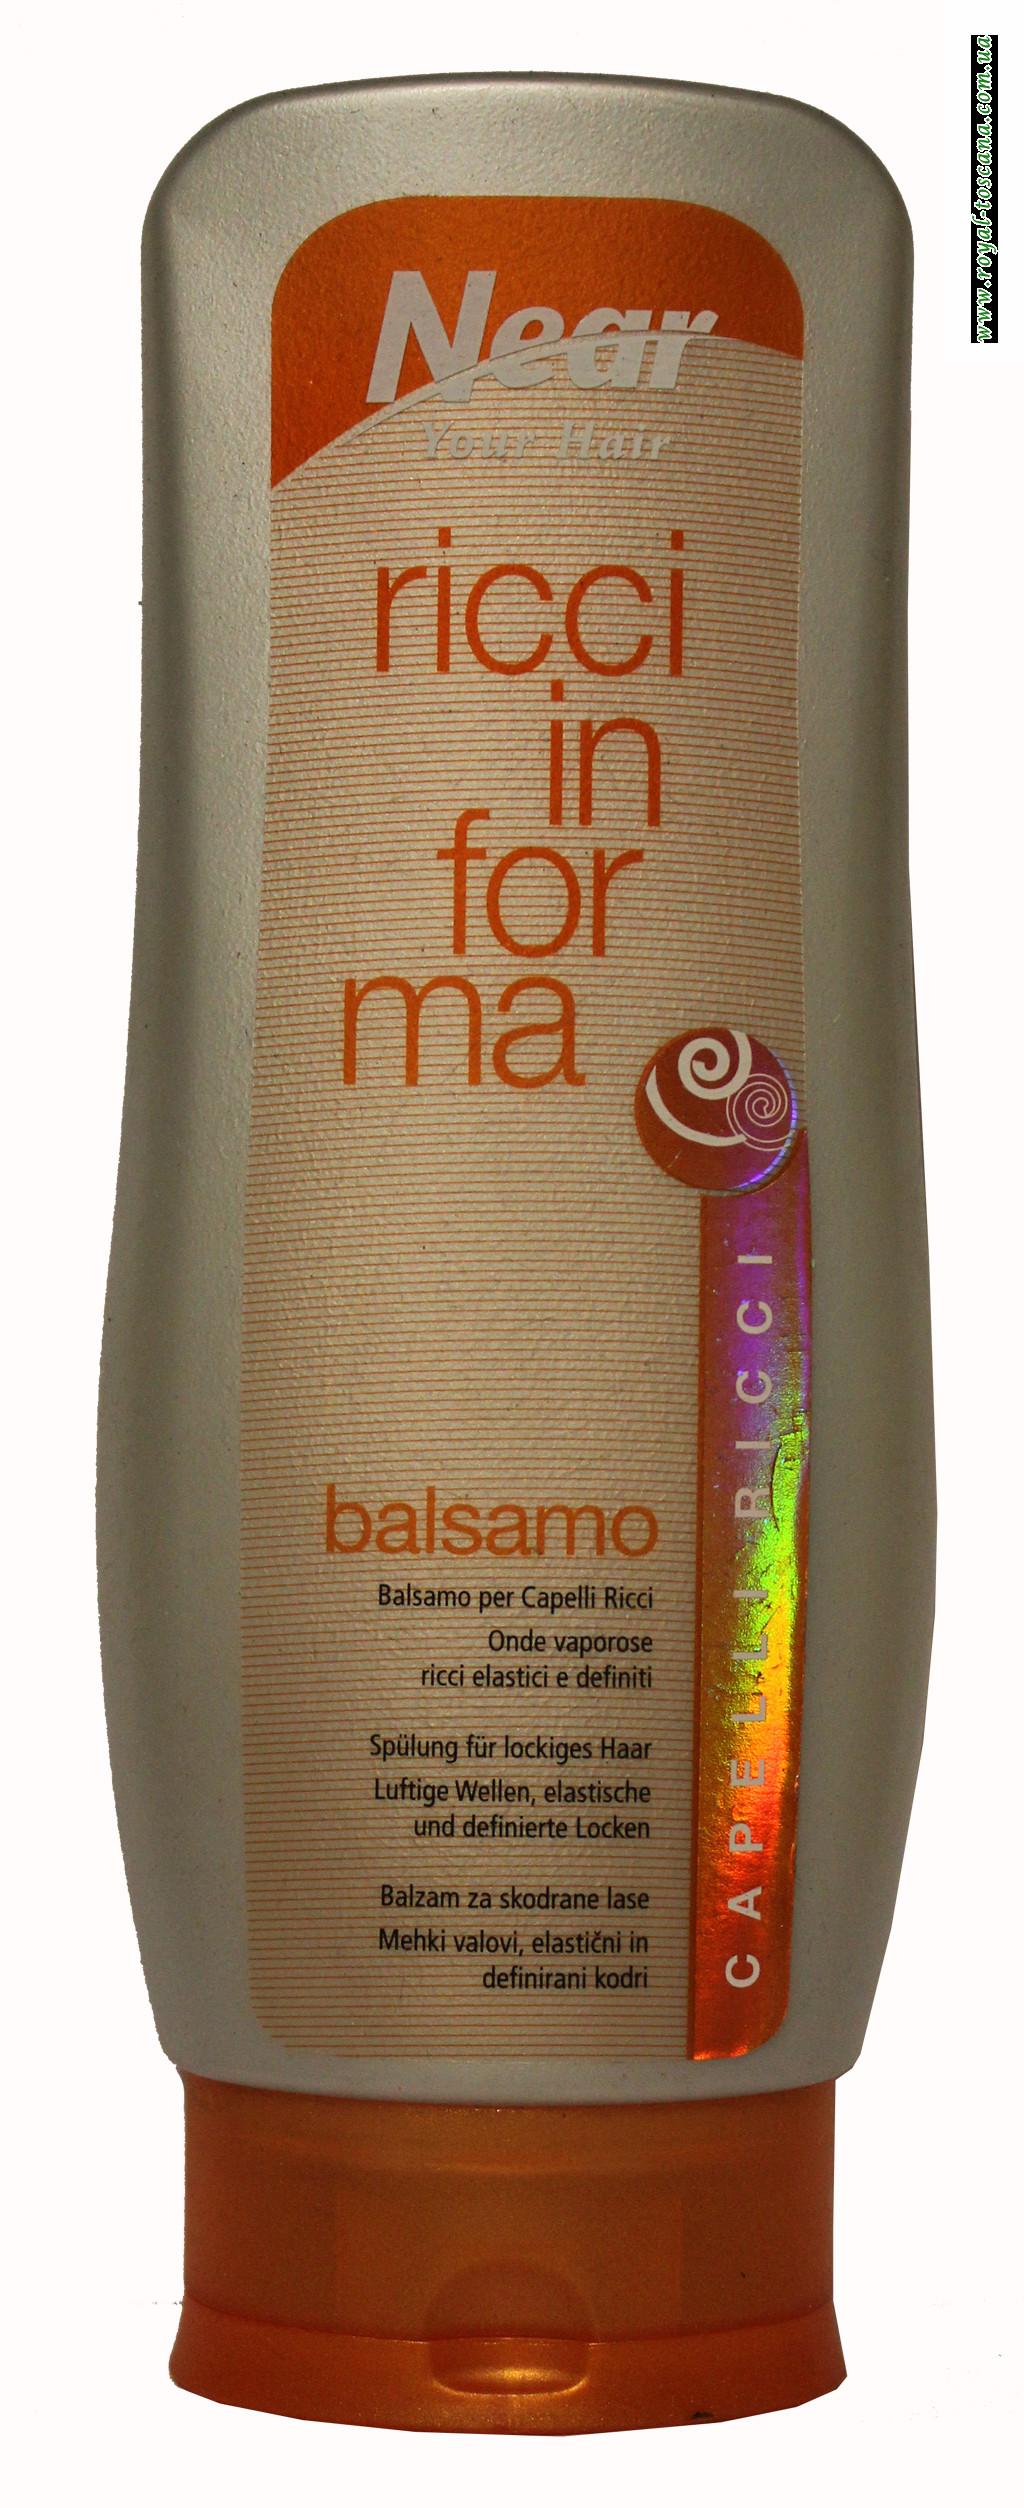 Бальзам для вьющихся волос Near Capellini Ricci in Forma